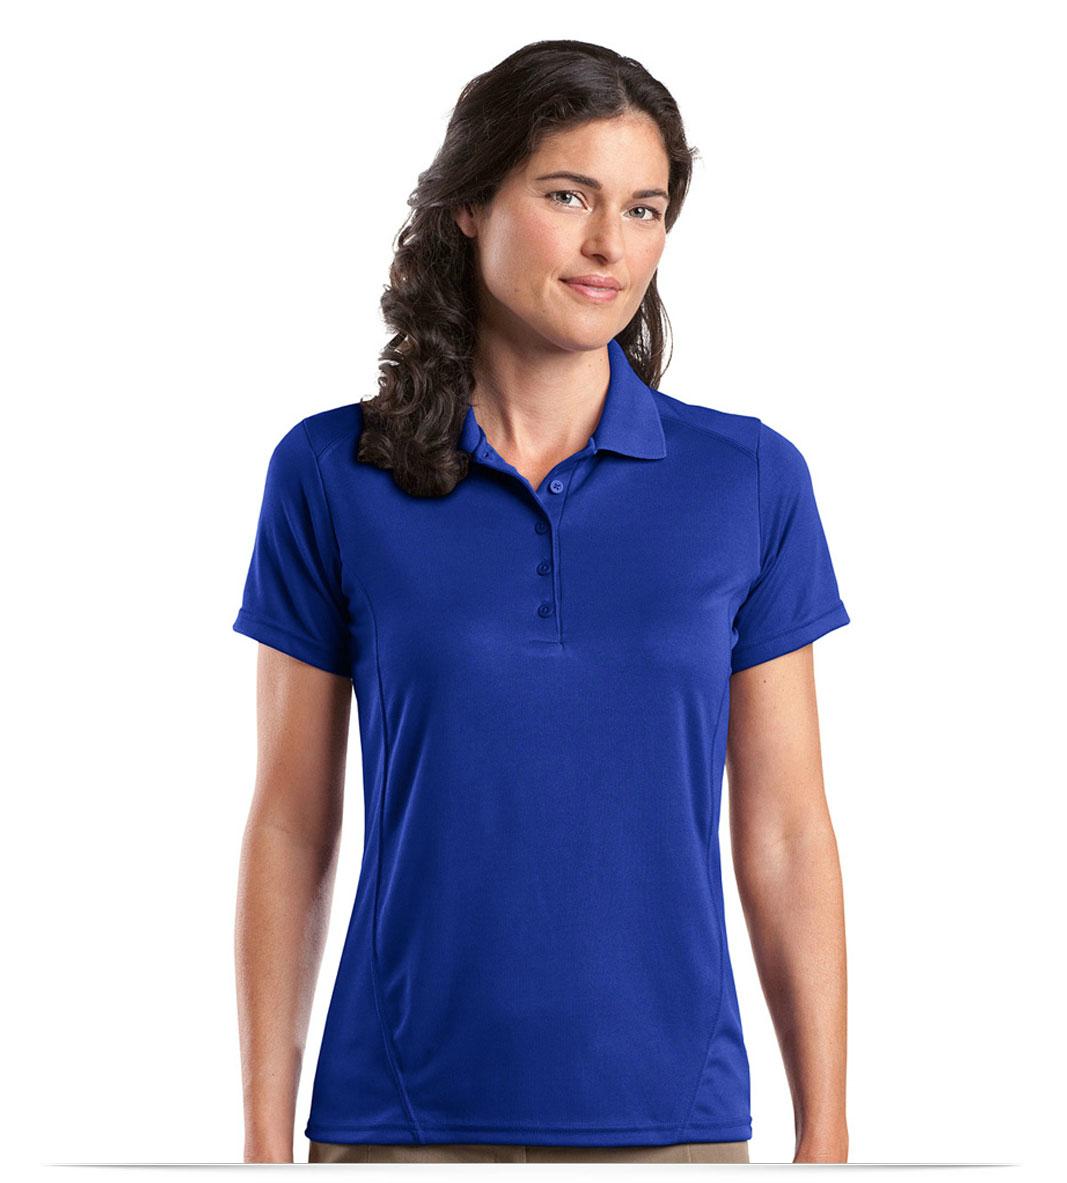 390224232d3 Design Embroidered Custom Ladies Dry Polo Shirt online at AllStar Logo